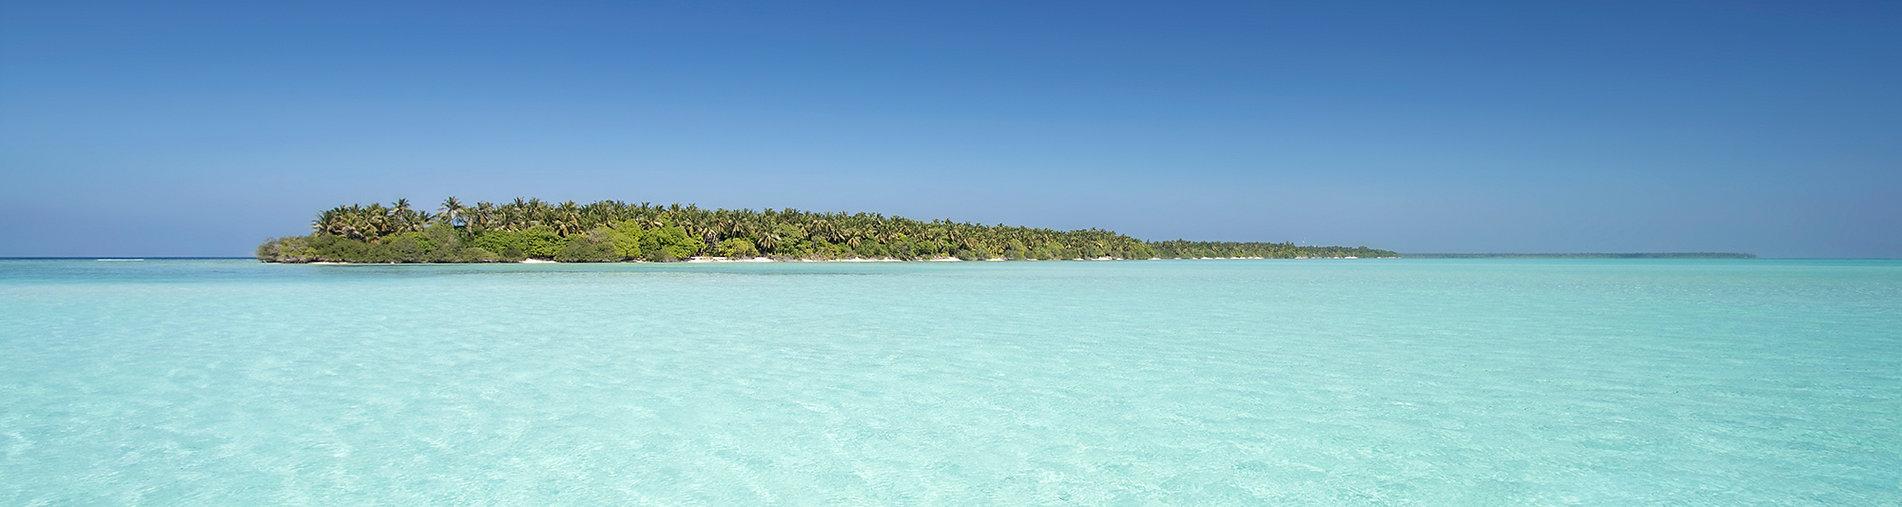 Goidhoo Atoll, Fehendhoo, Maldives